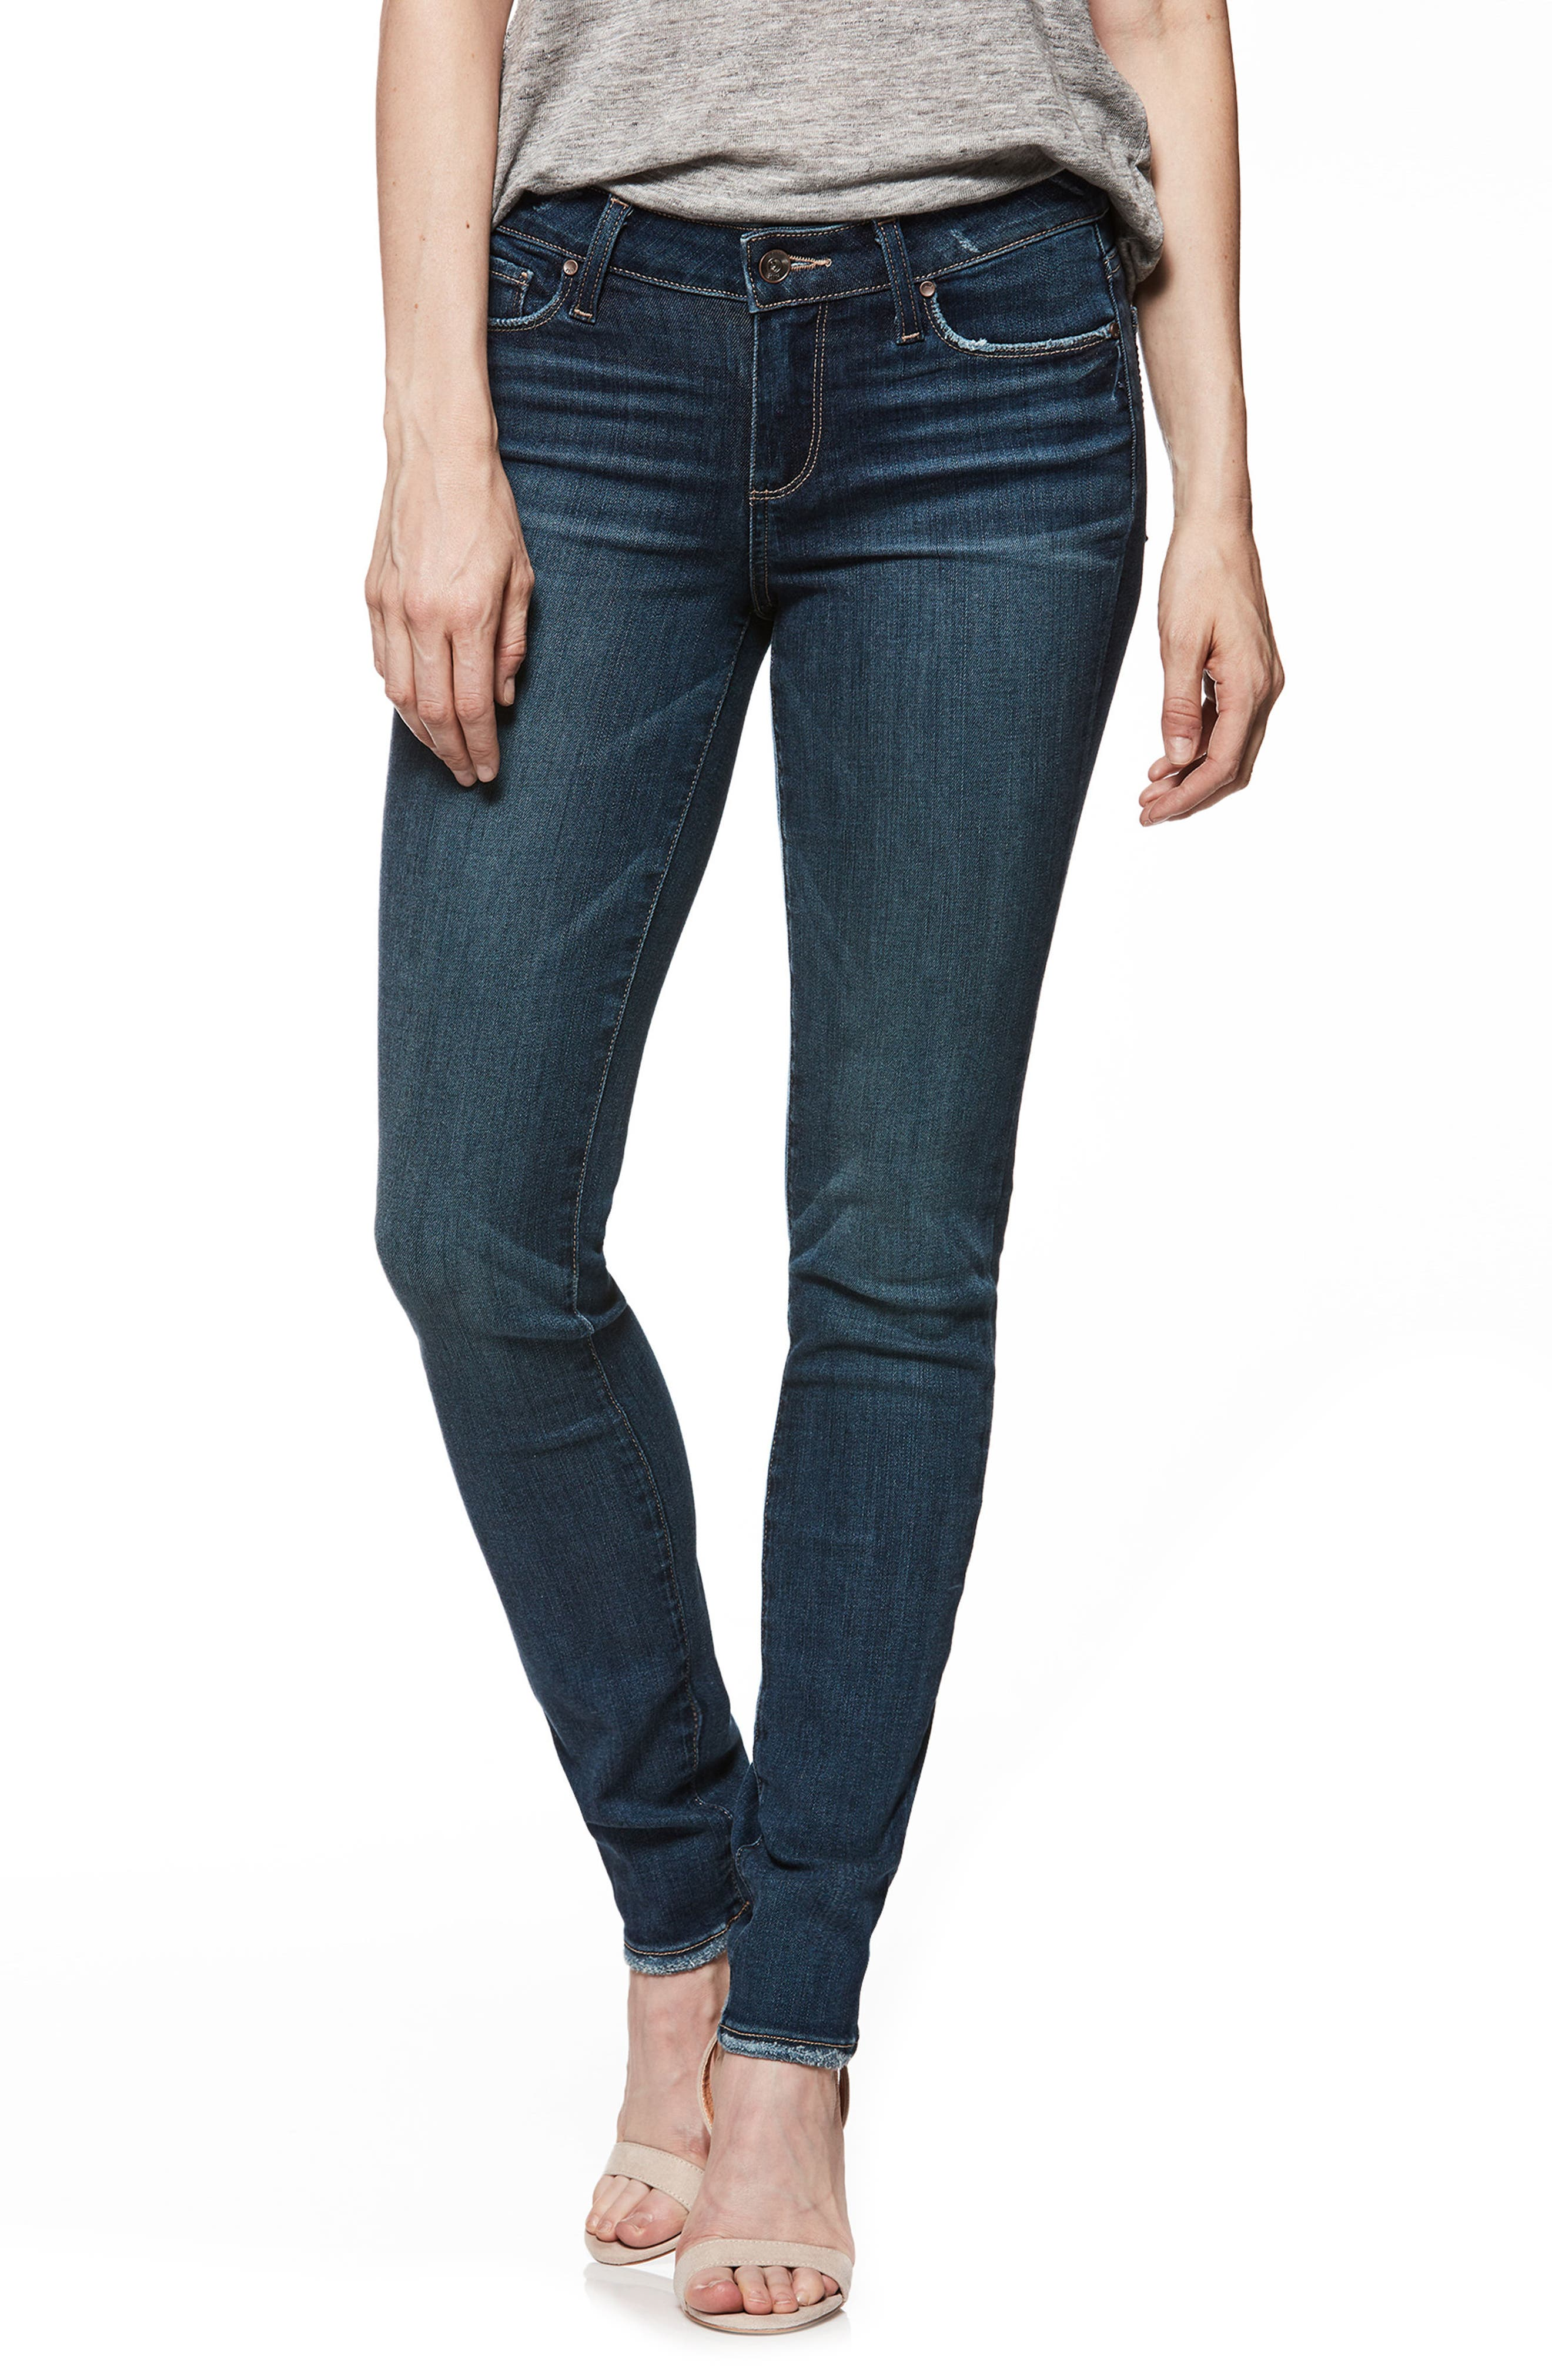 Transcend Vintage - Verdugo Ultra Skinny Jeans,                             Main thumbnail 1, color,                             400